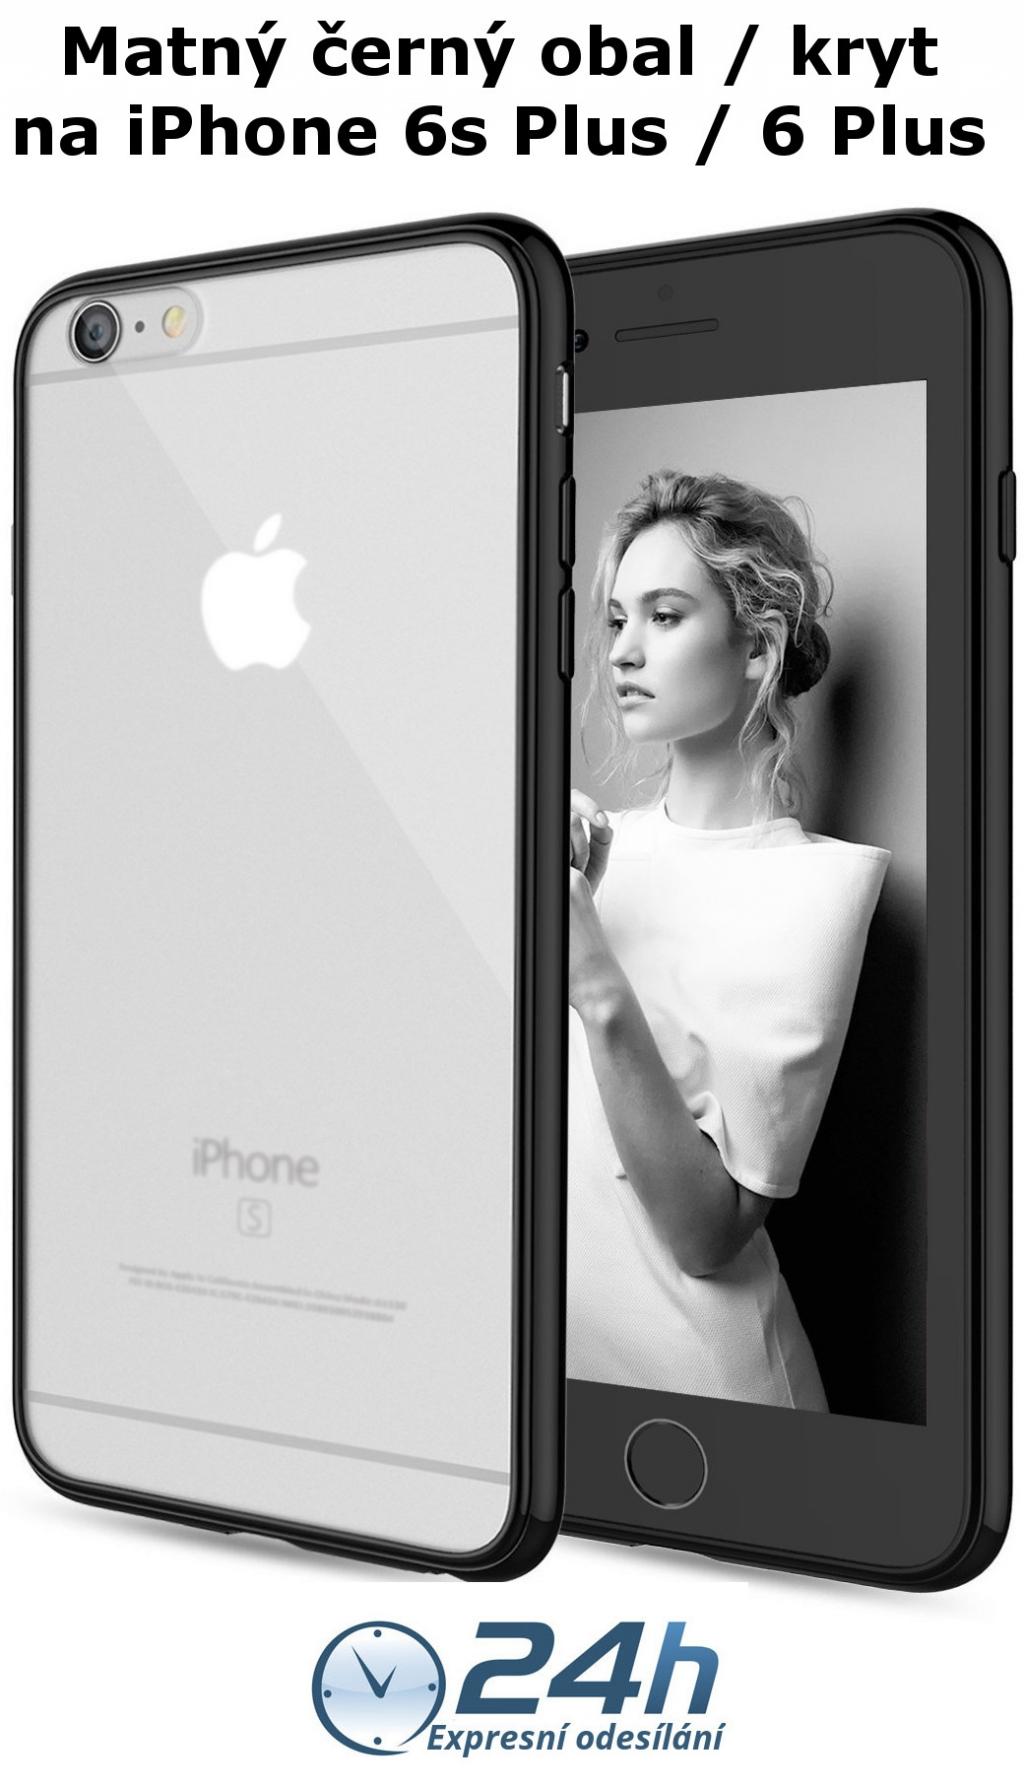 Černý matný obal / kryt na iPhone 6s Plus / 6 Plus